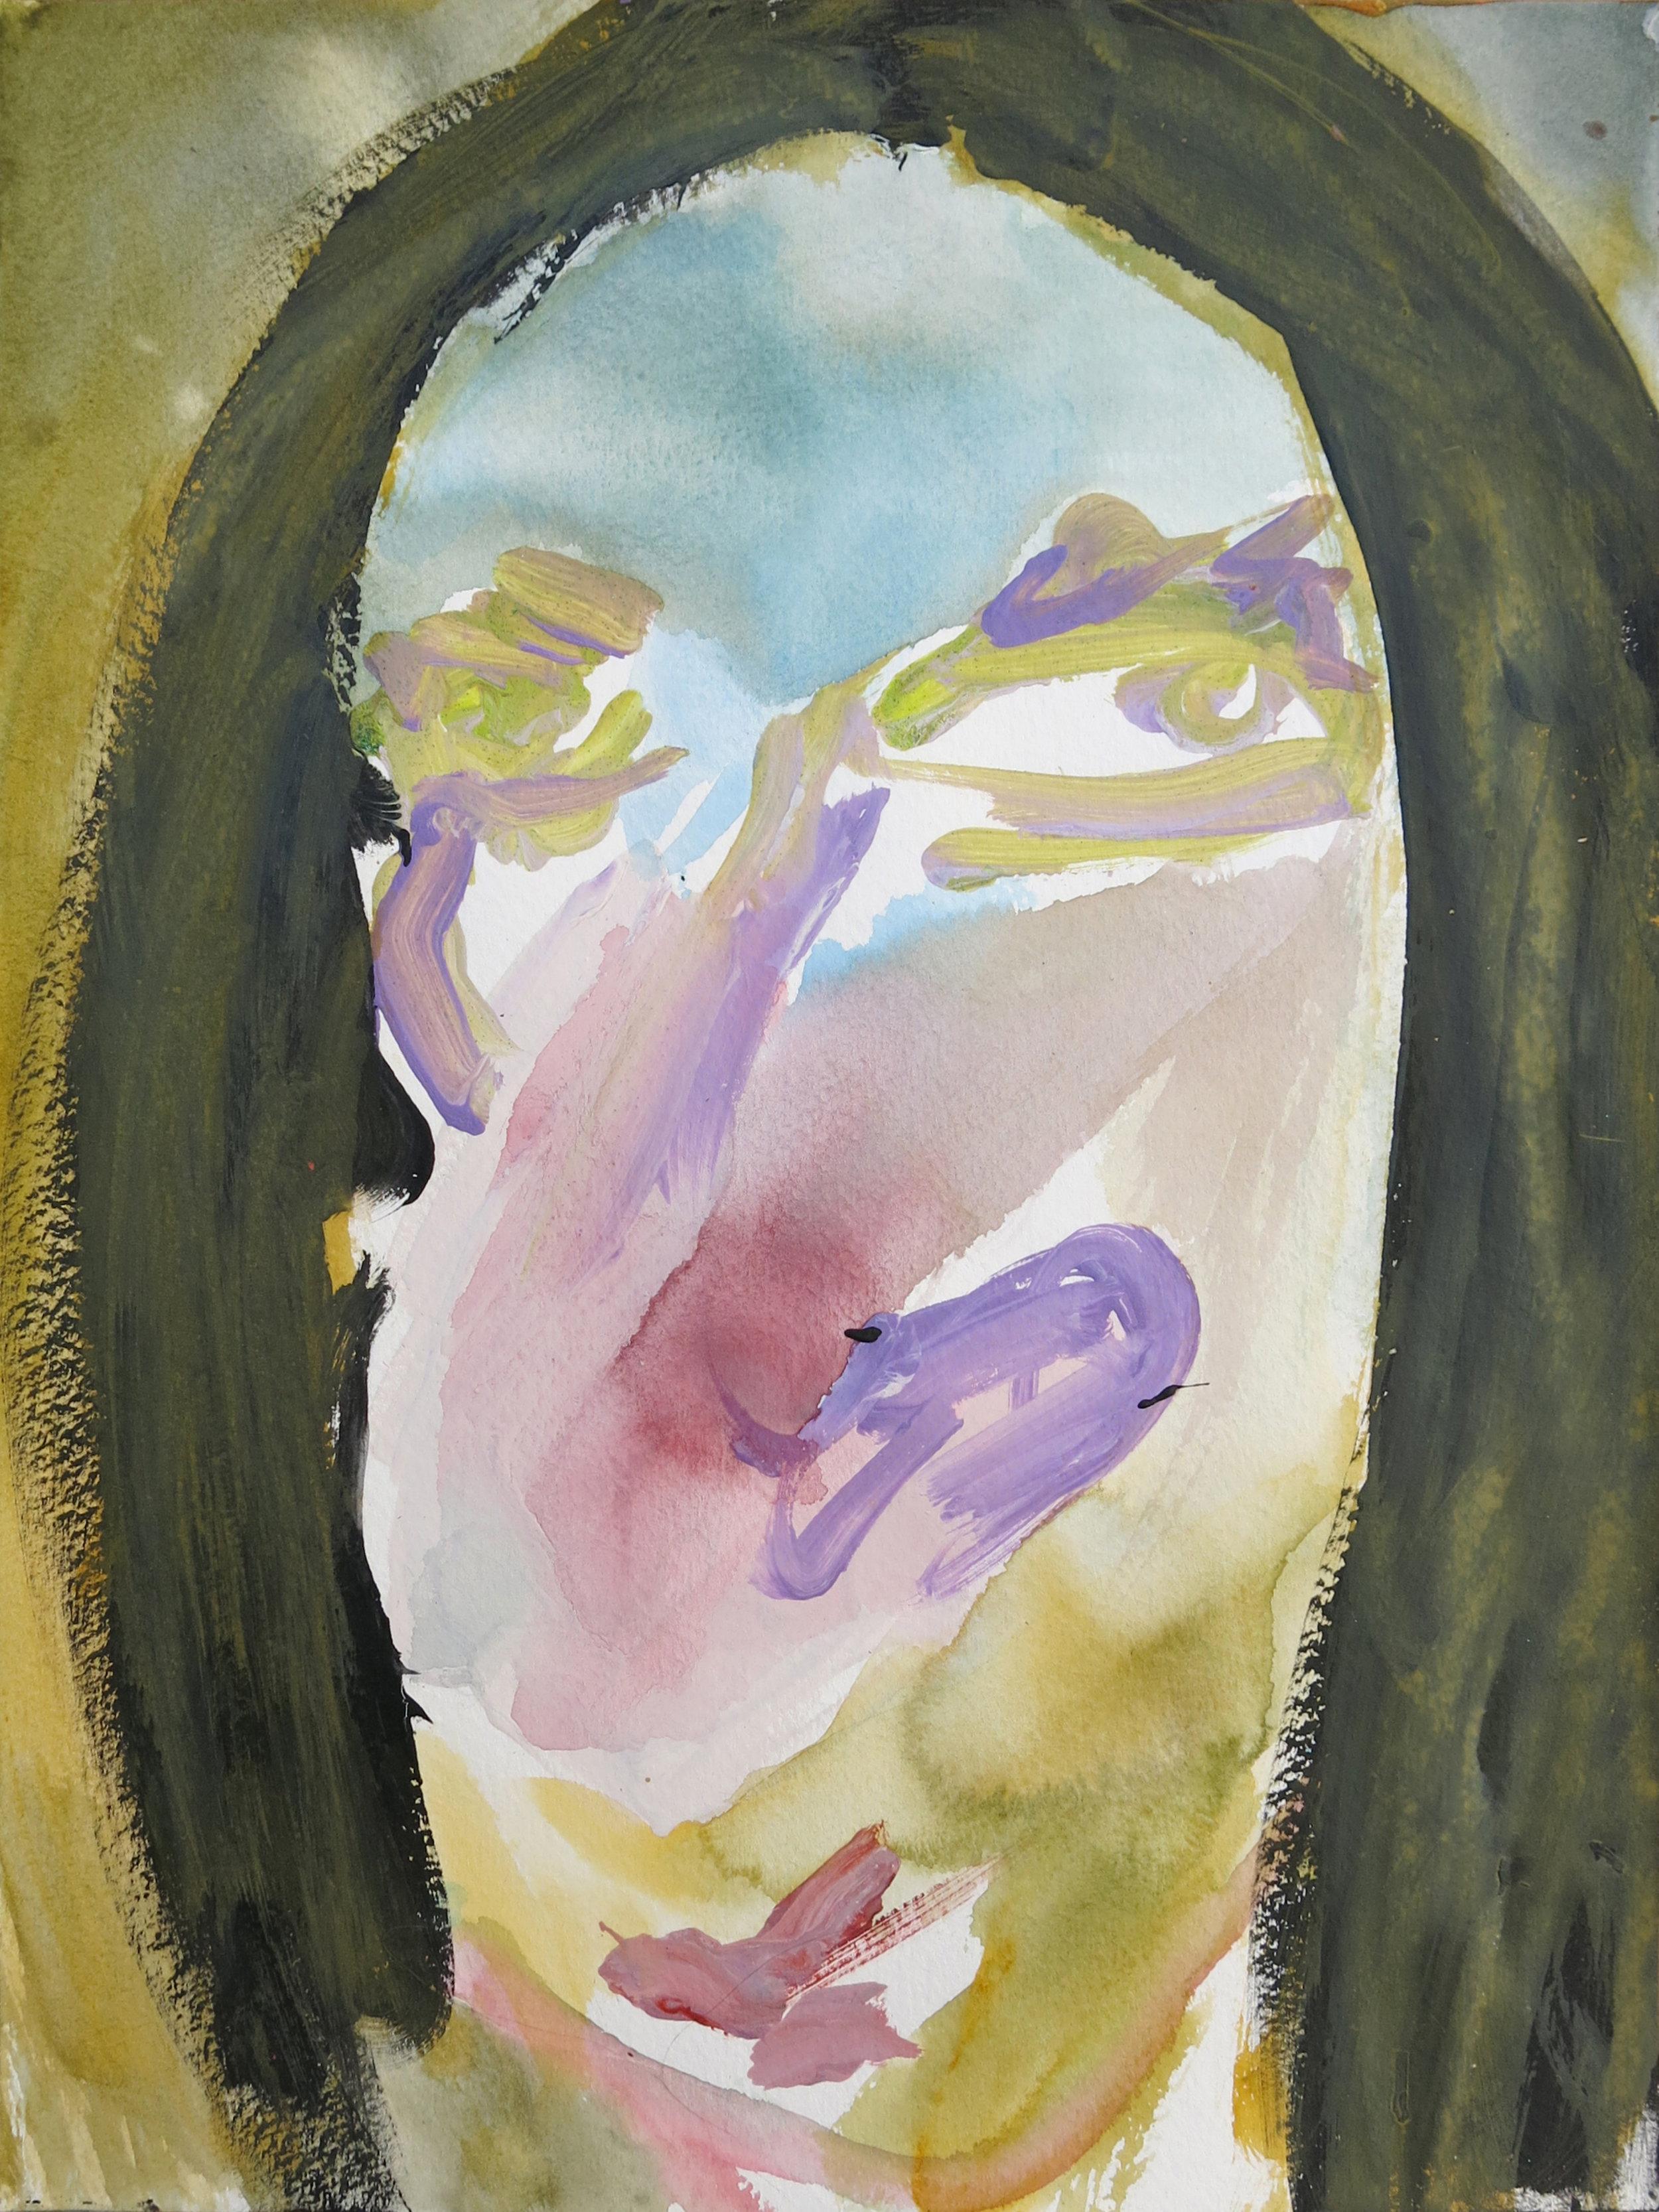 Barbra Streisand Portrait #219